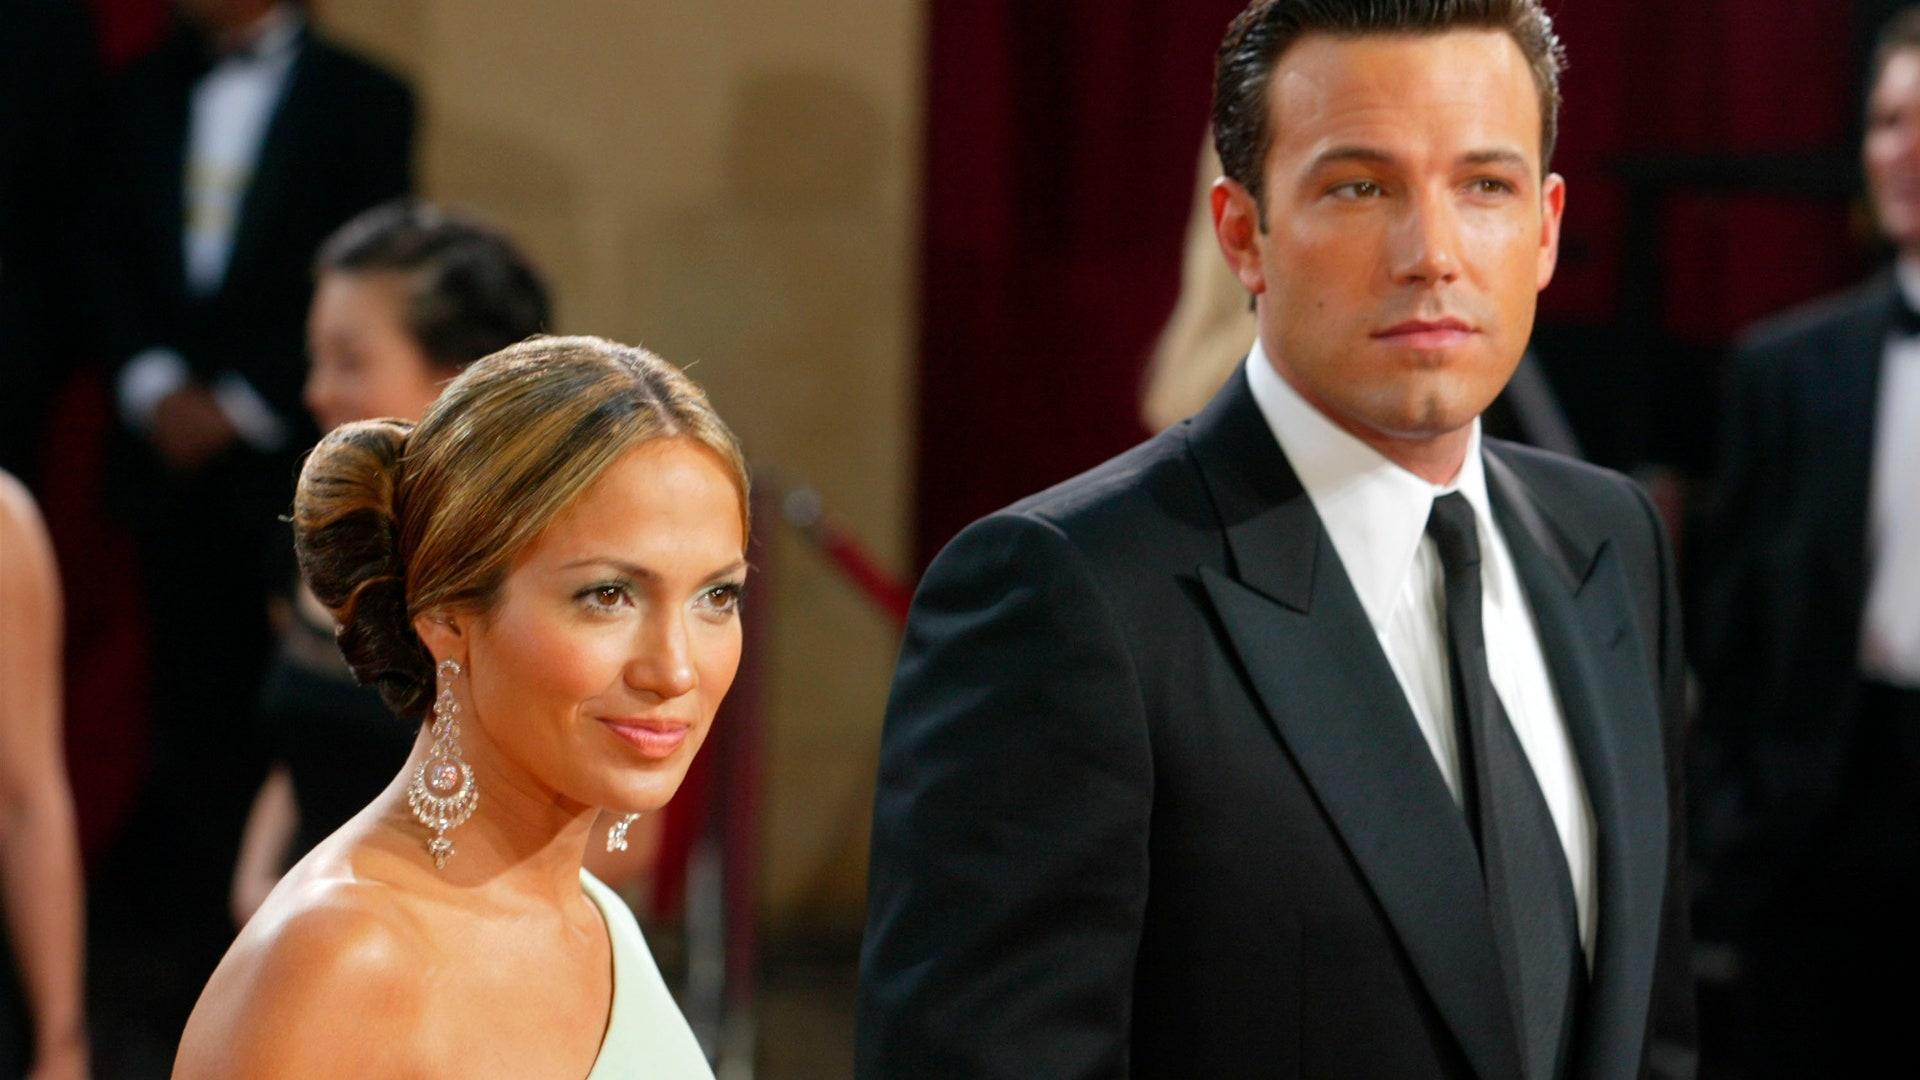 17 thoughts I had about Jennifer Lopez and Ben Afflecks